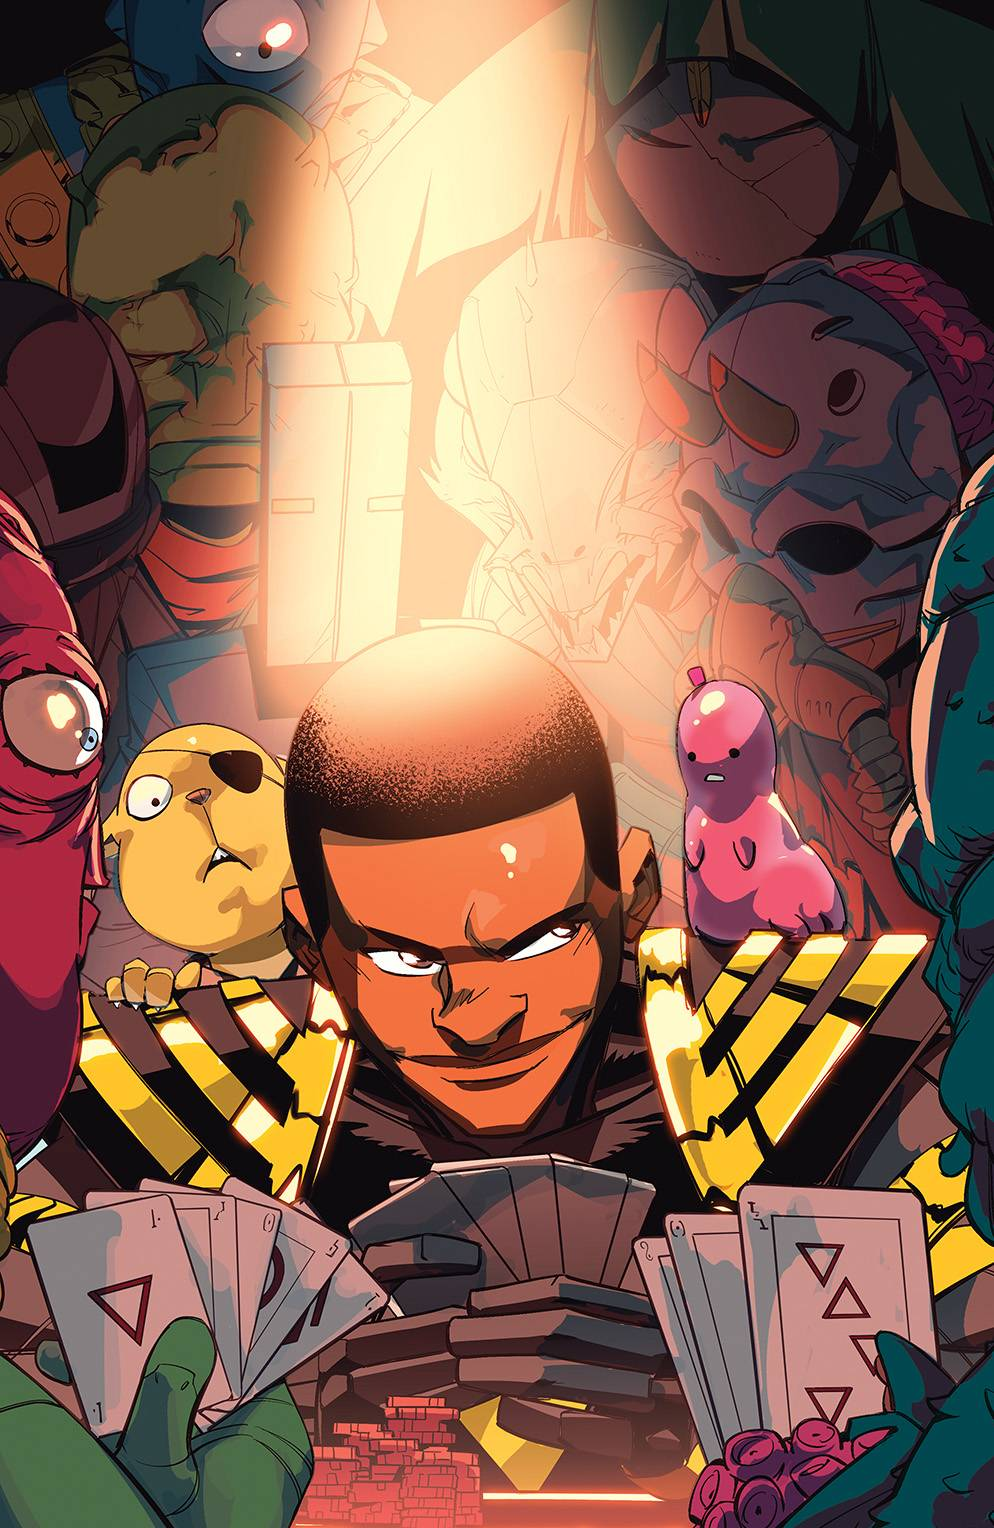 STL180047 ComicList: BOOM! Studios New Releases for 03/24/2021